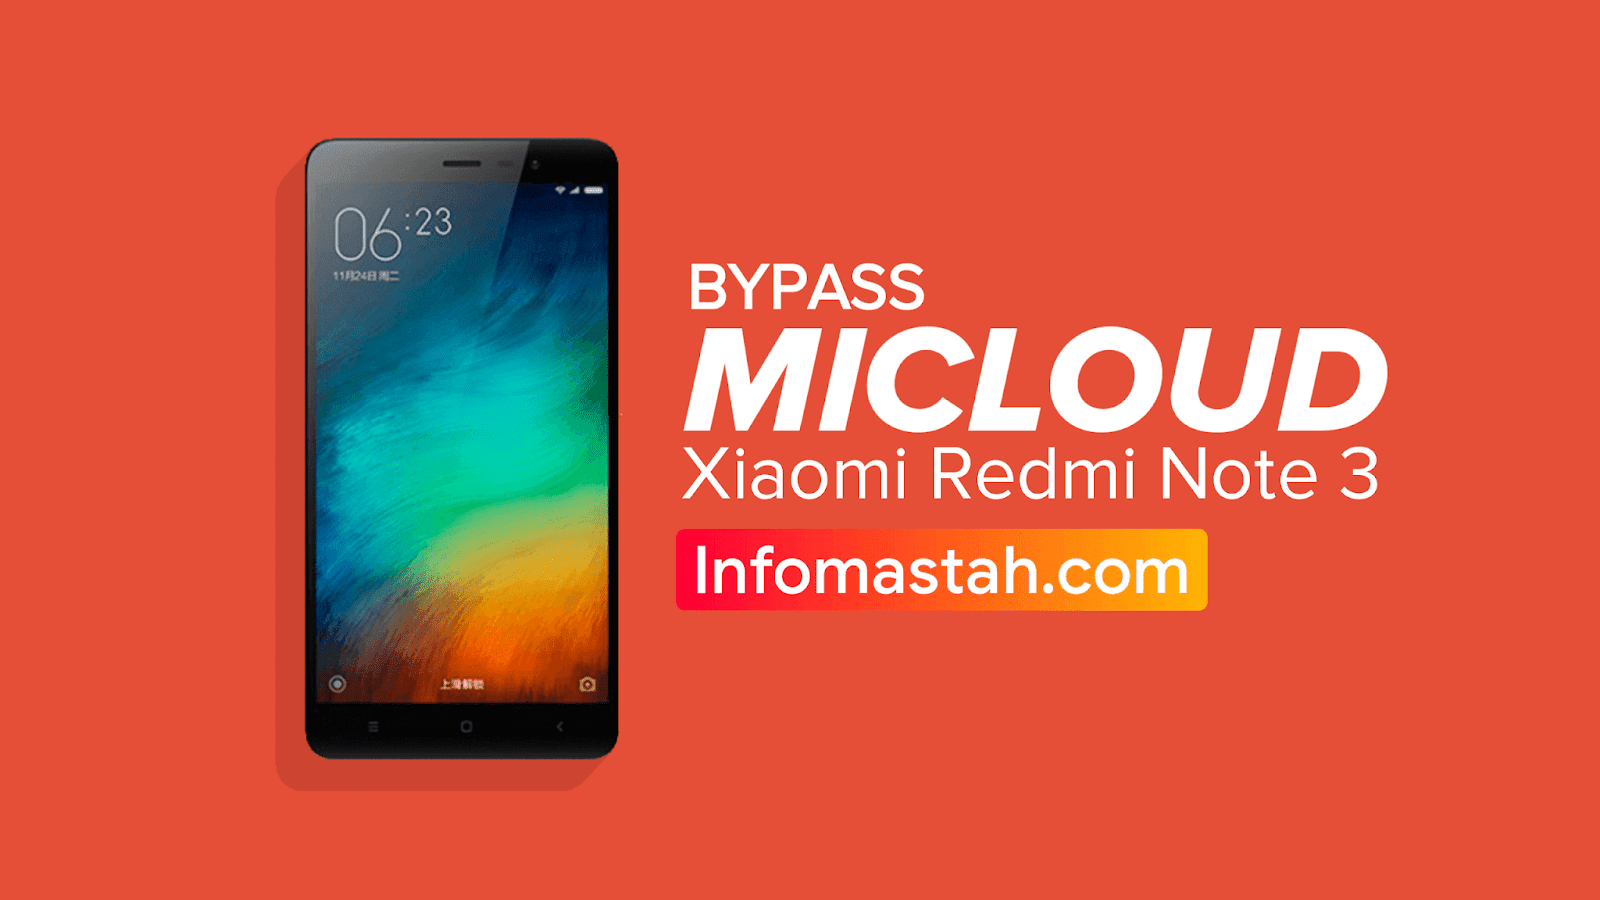 Cara Bypass Mi Cloud Xiaomi Redmi Note 3 Mediatek ( Hennessy )